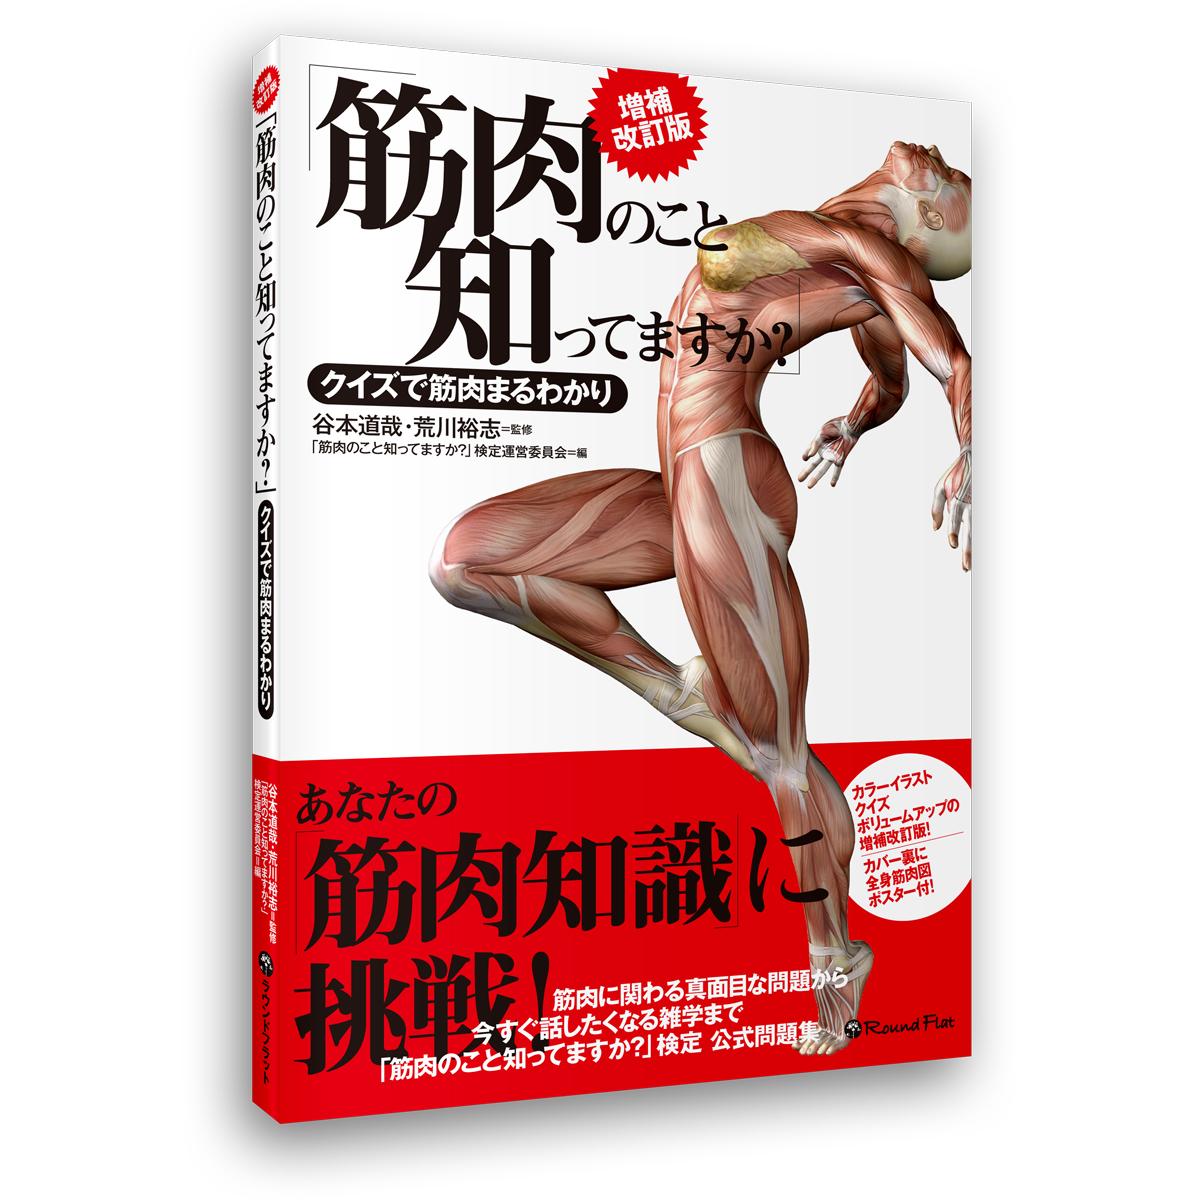 Do you know muscle? Yes. I am a muscle doctor. 筋肉検定 公式問題集 「「筋肉のこと知ってますか?」-クイズで筋肉まるわかり 増補改訂版」 ラウンドフラット 谷本道哉 荒川裕志 書籍 雑学 ネタ帳 送料無料 キャンペーン